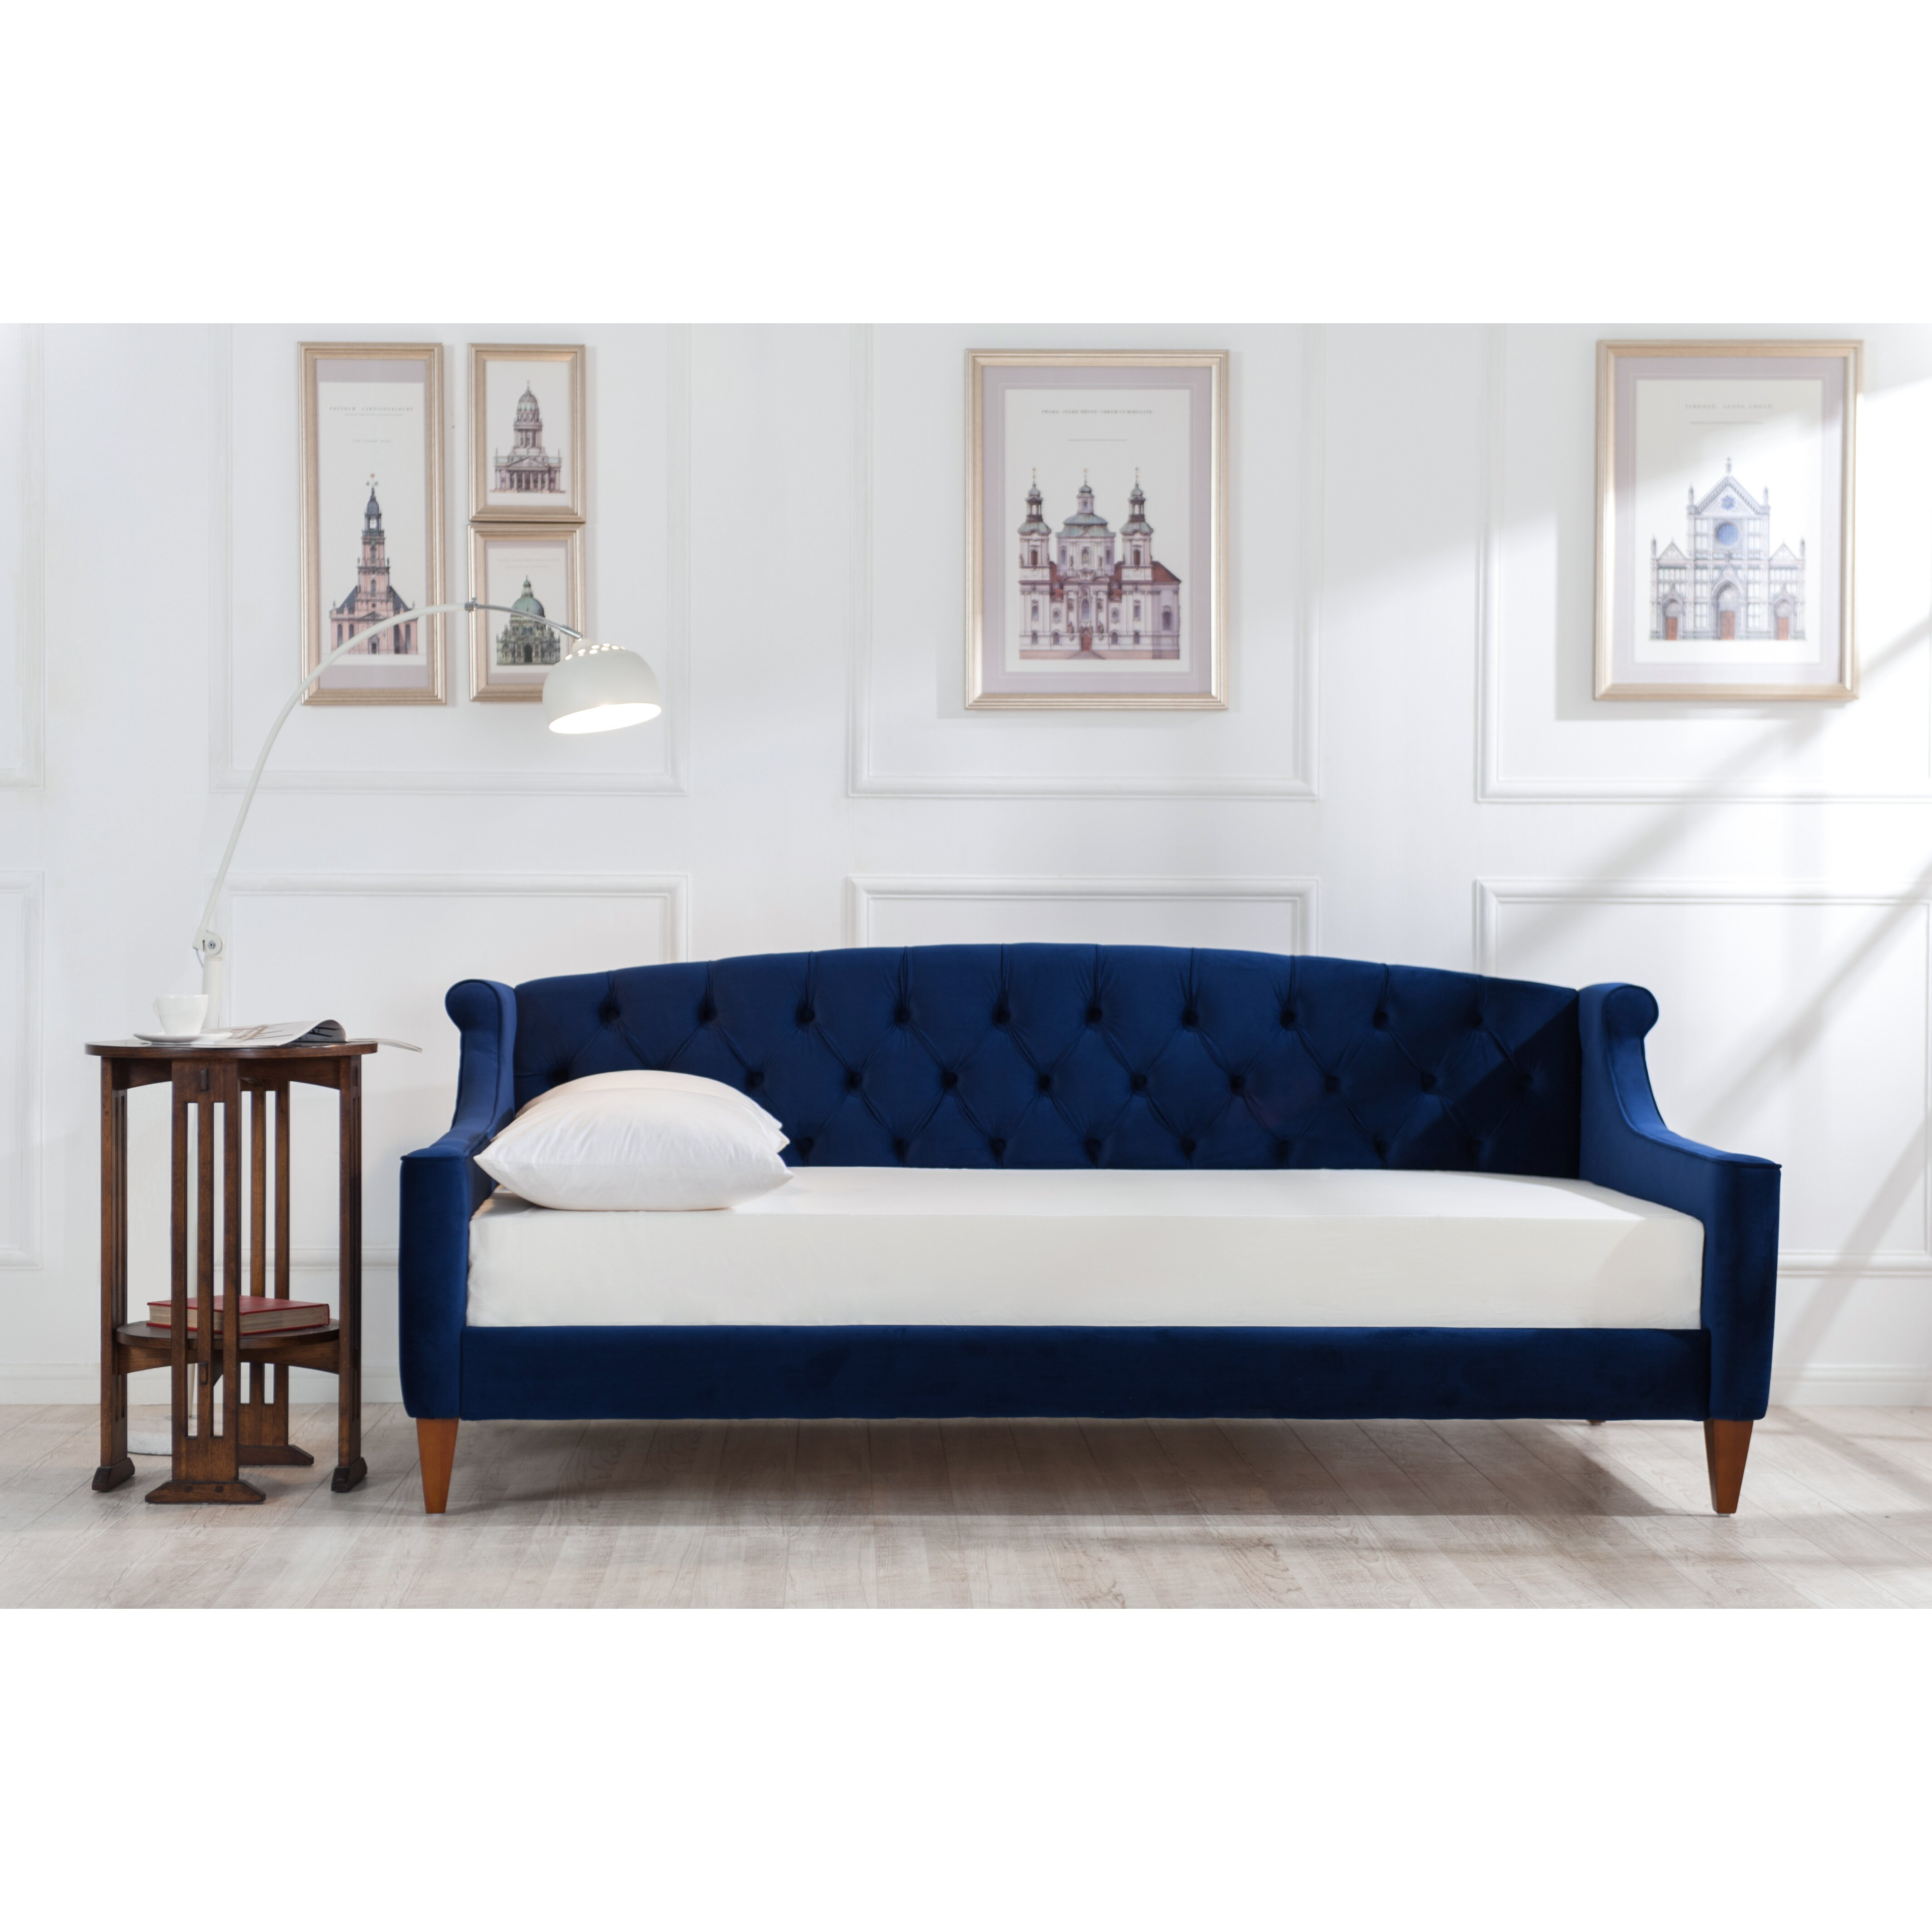 jennifer taylor lucy upholstered sleeper sofa - Sleeper Chair